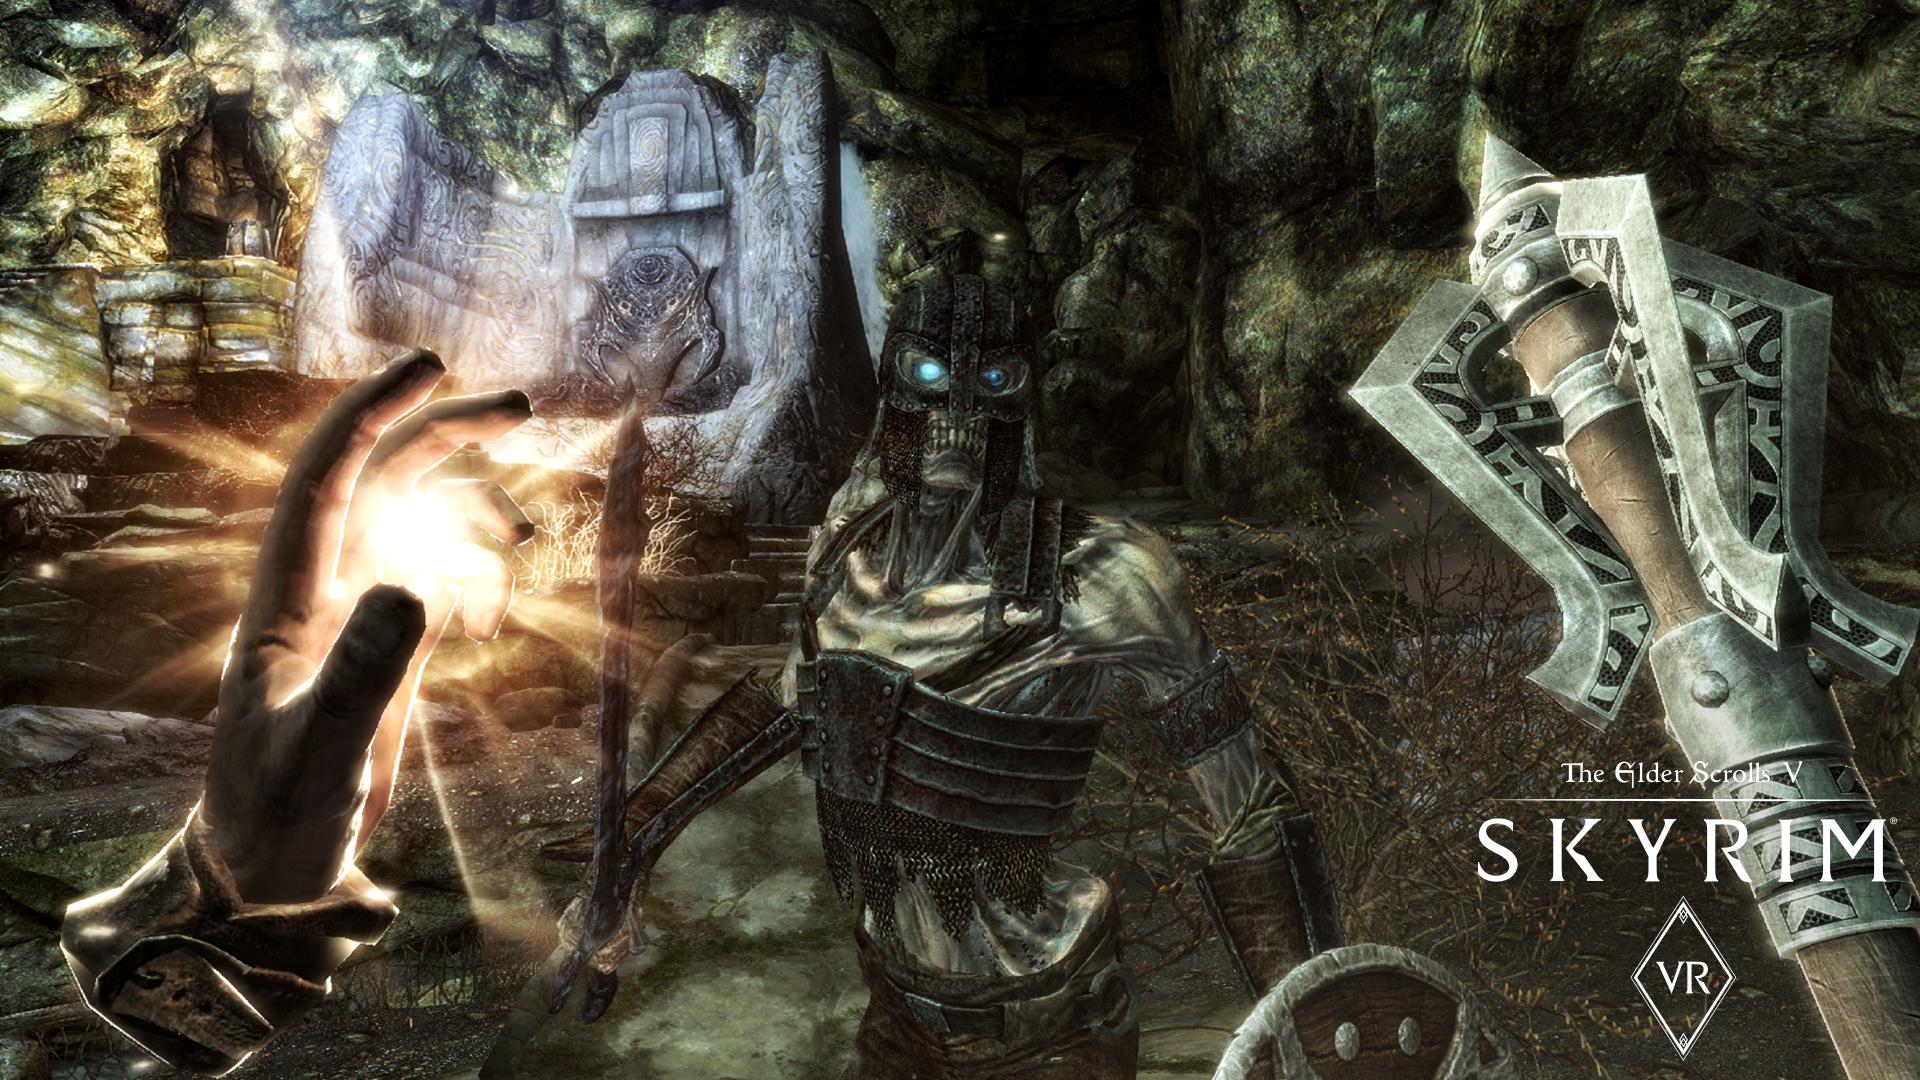 Skyrim_VR_PC_Draugr_Full_Size.jpg